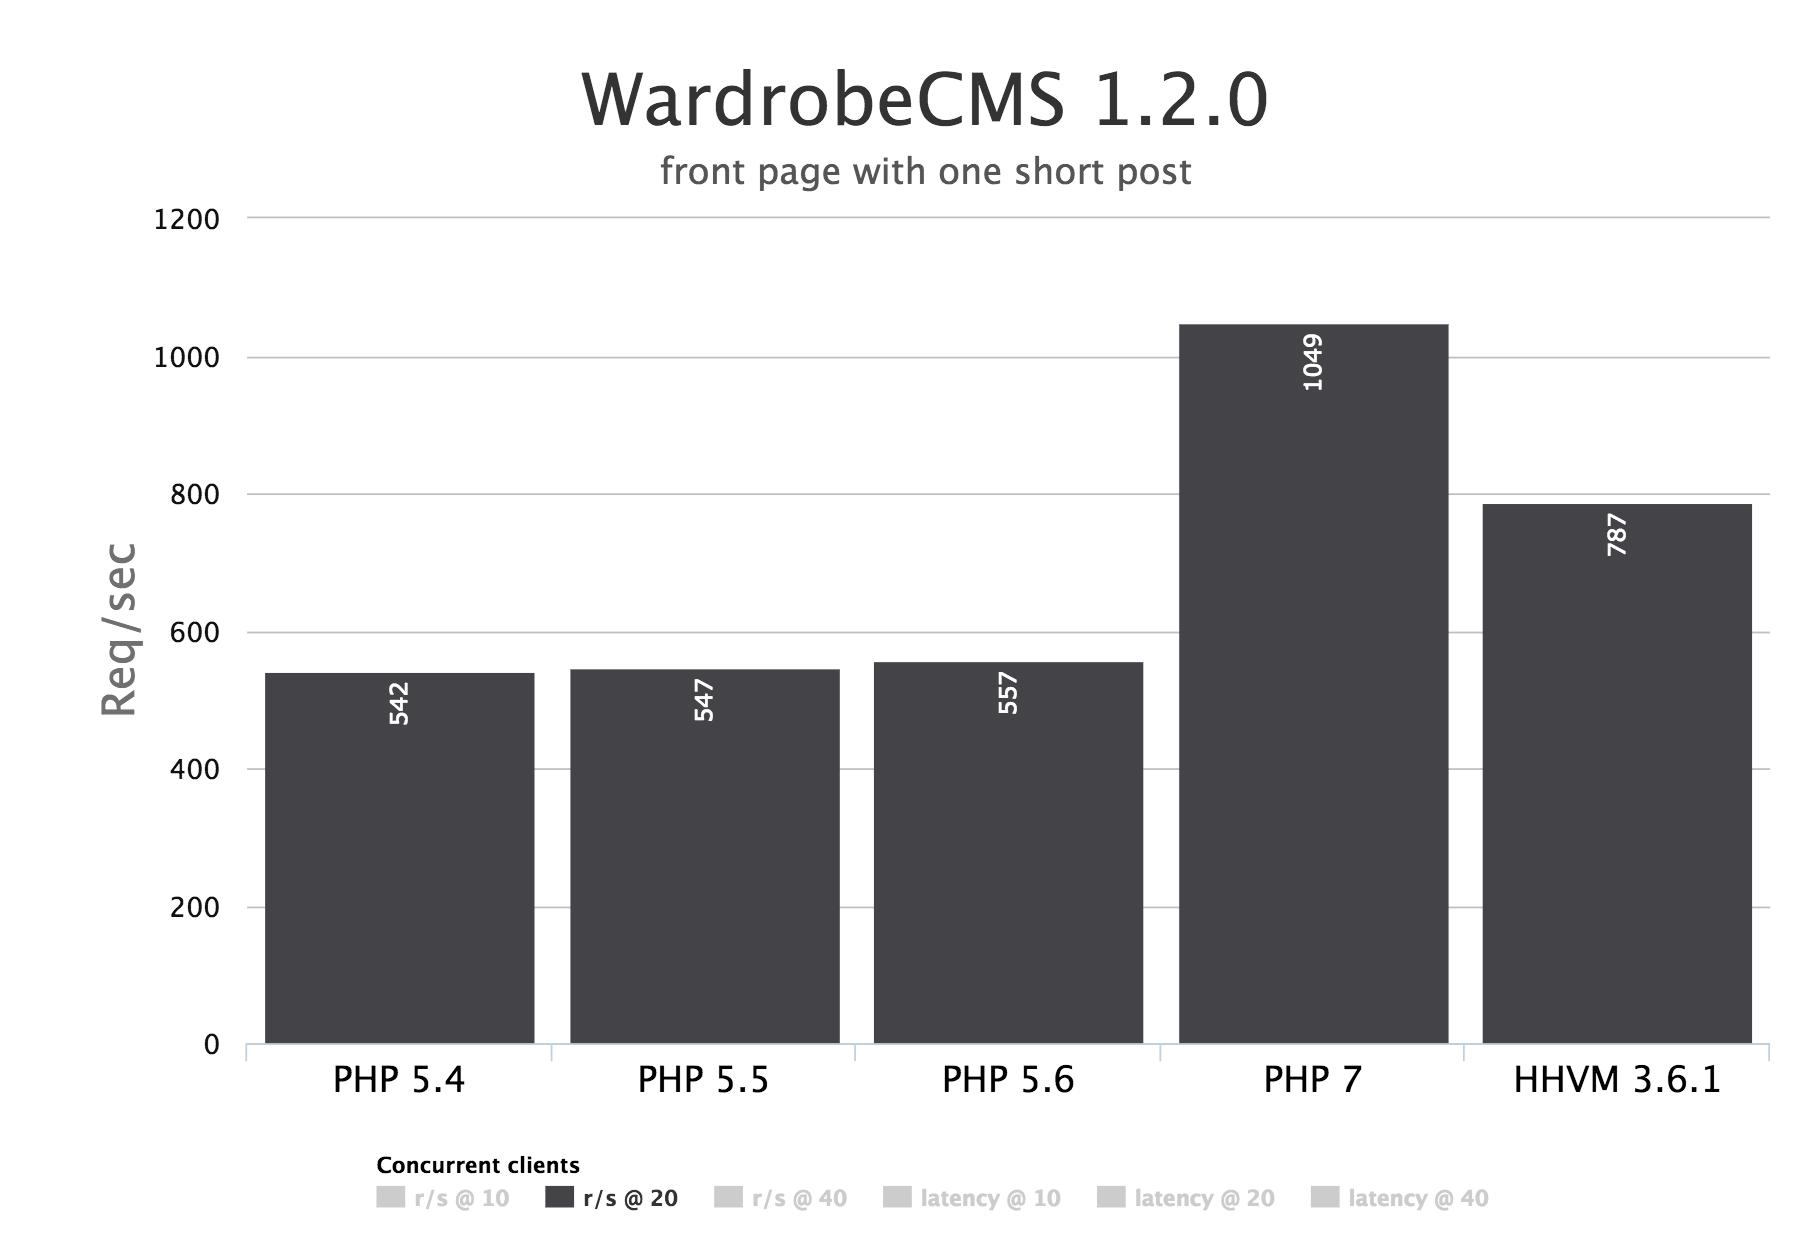 Wardrobe CMS 1.2.0